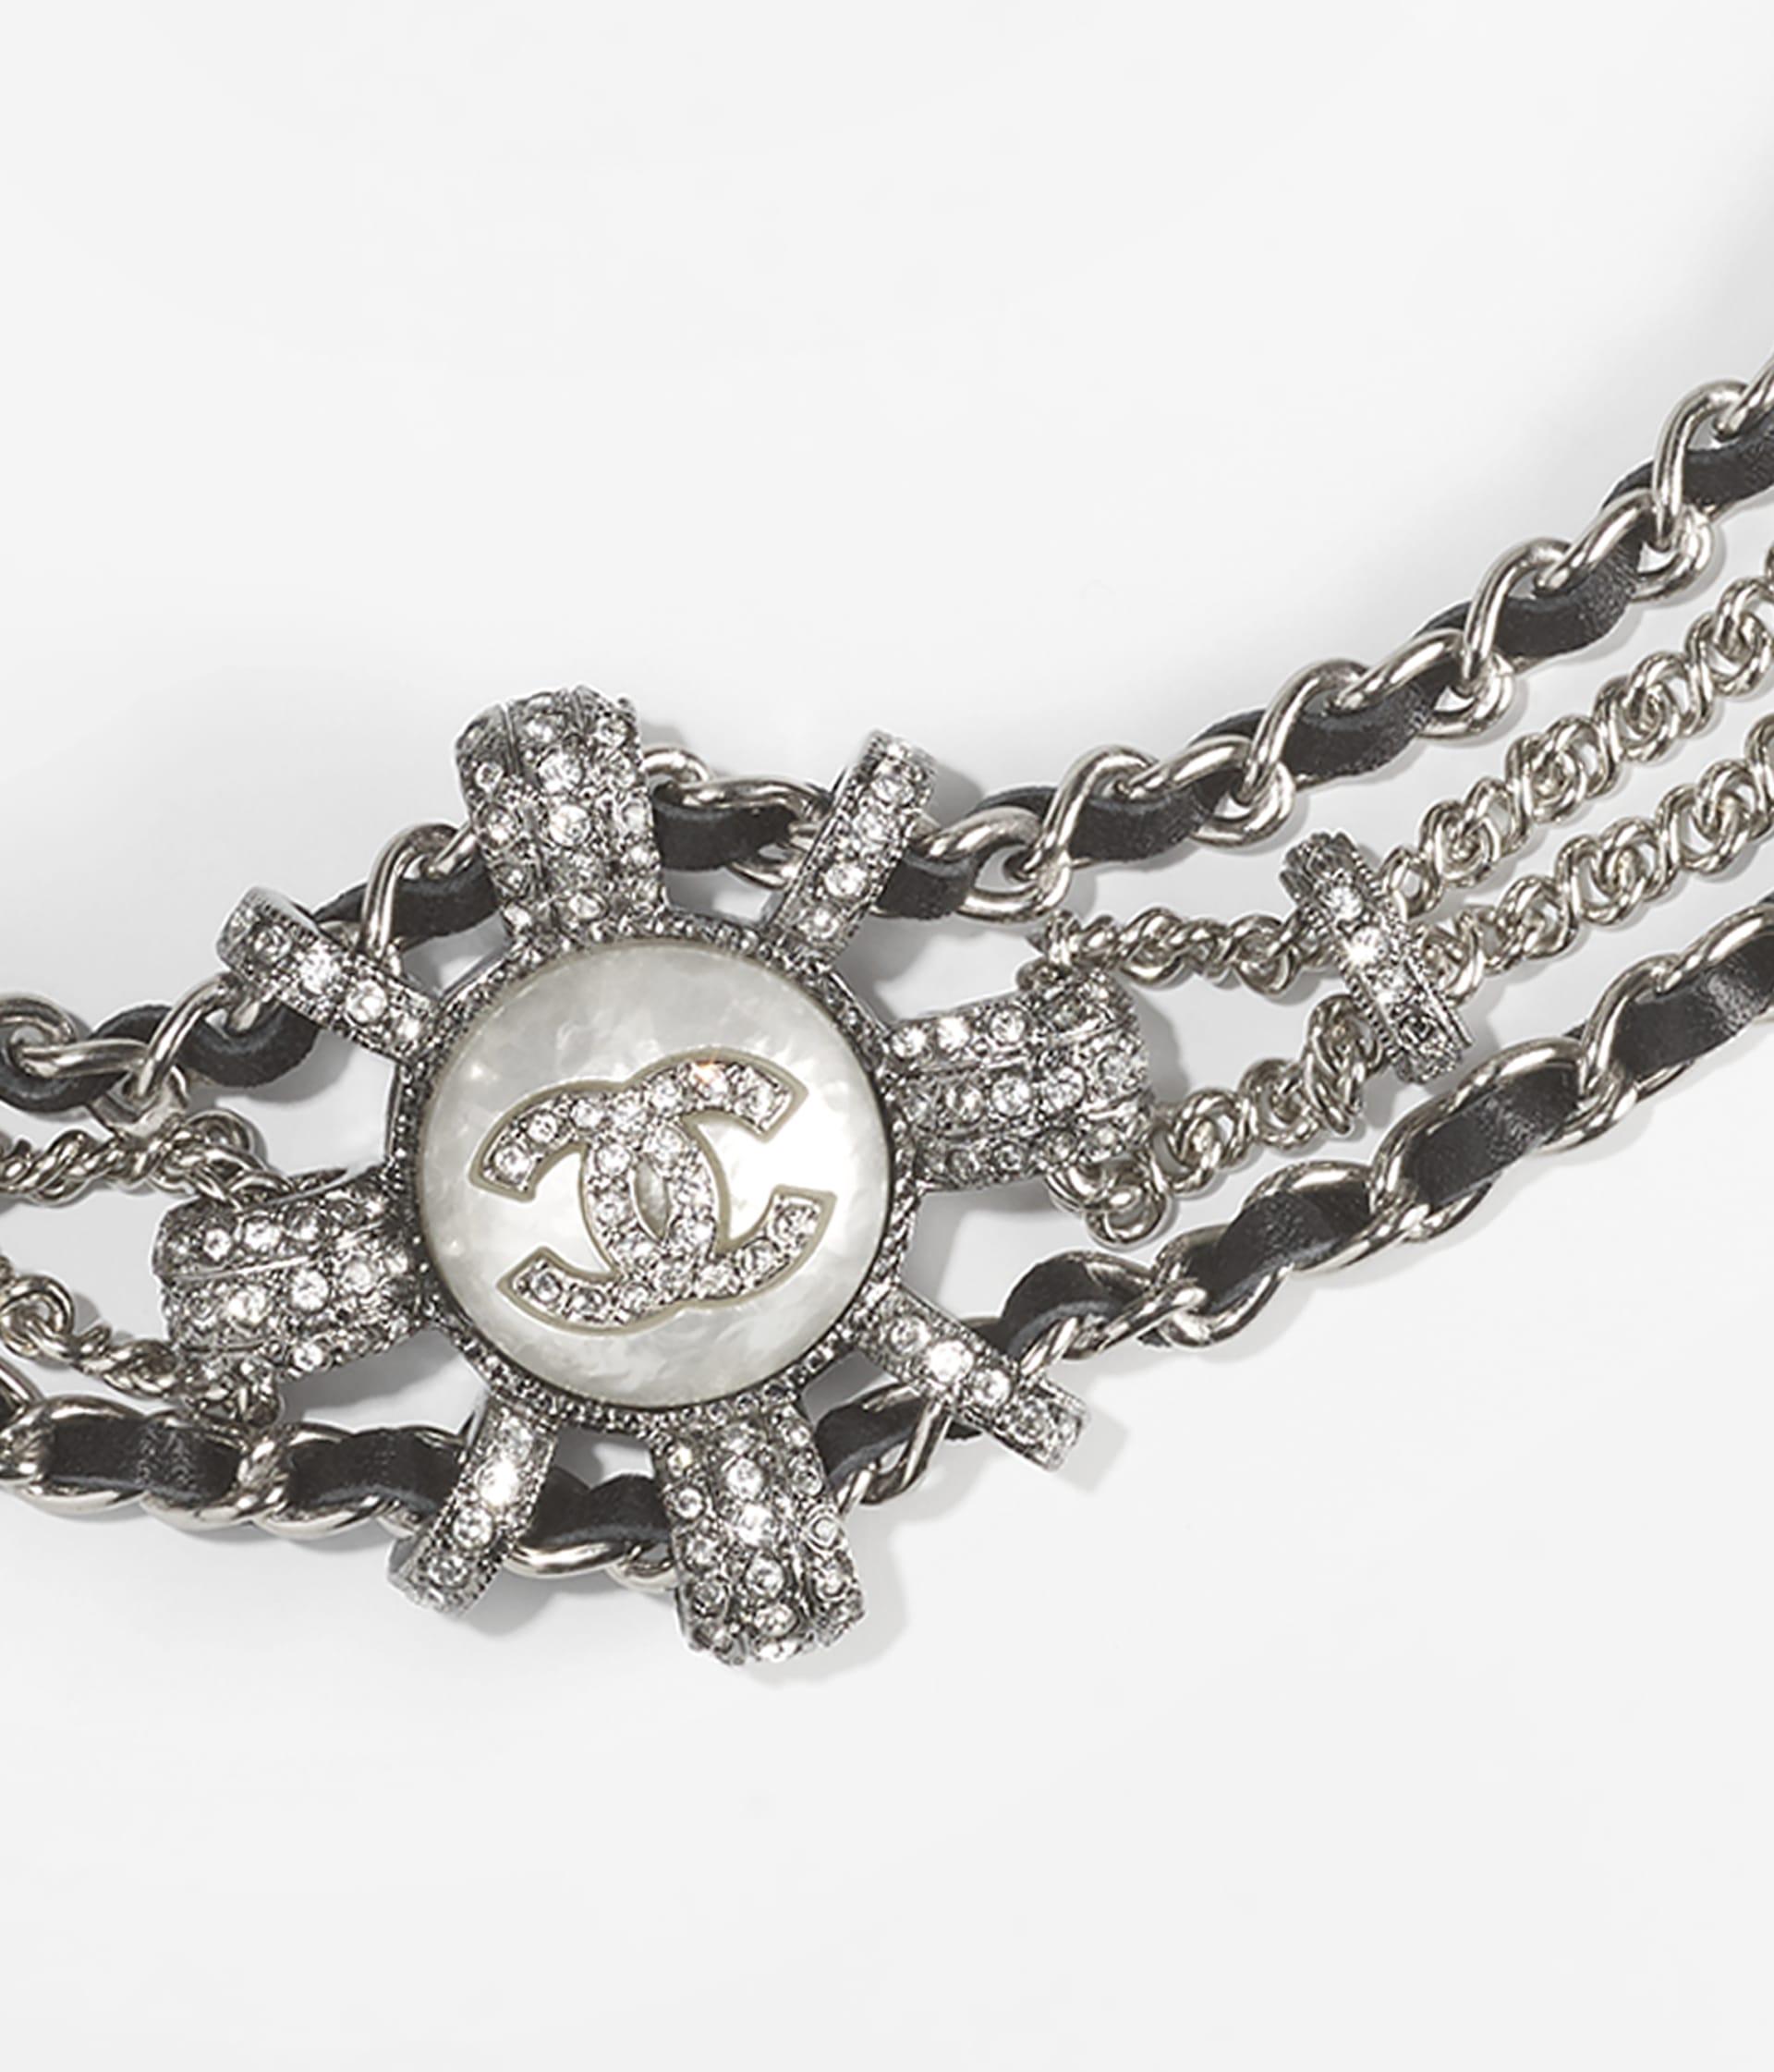 image 3 - Choker - Metal, Calfskin, Imitation Pearls & Strass - Silver, Ruthenium, Black, Pearly White & Crystal